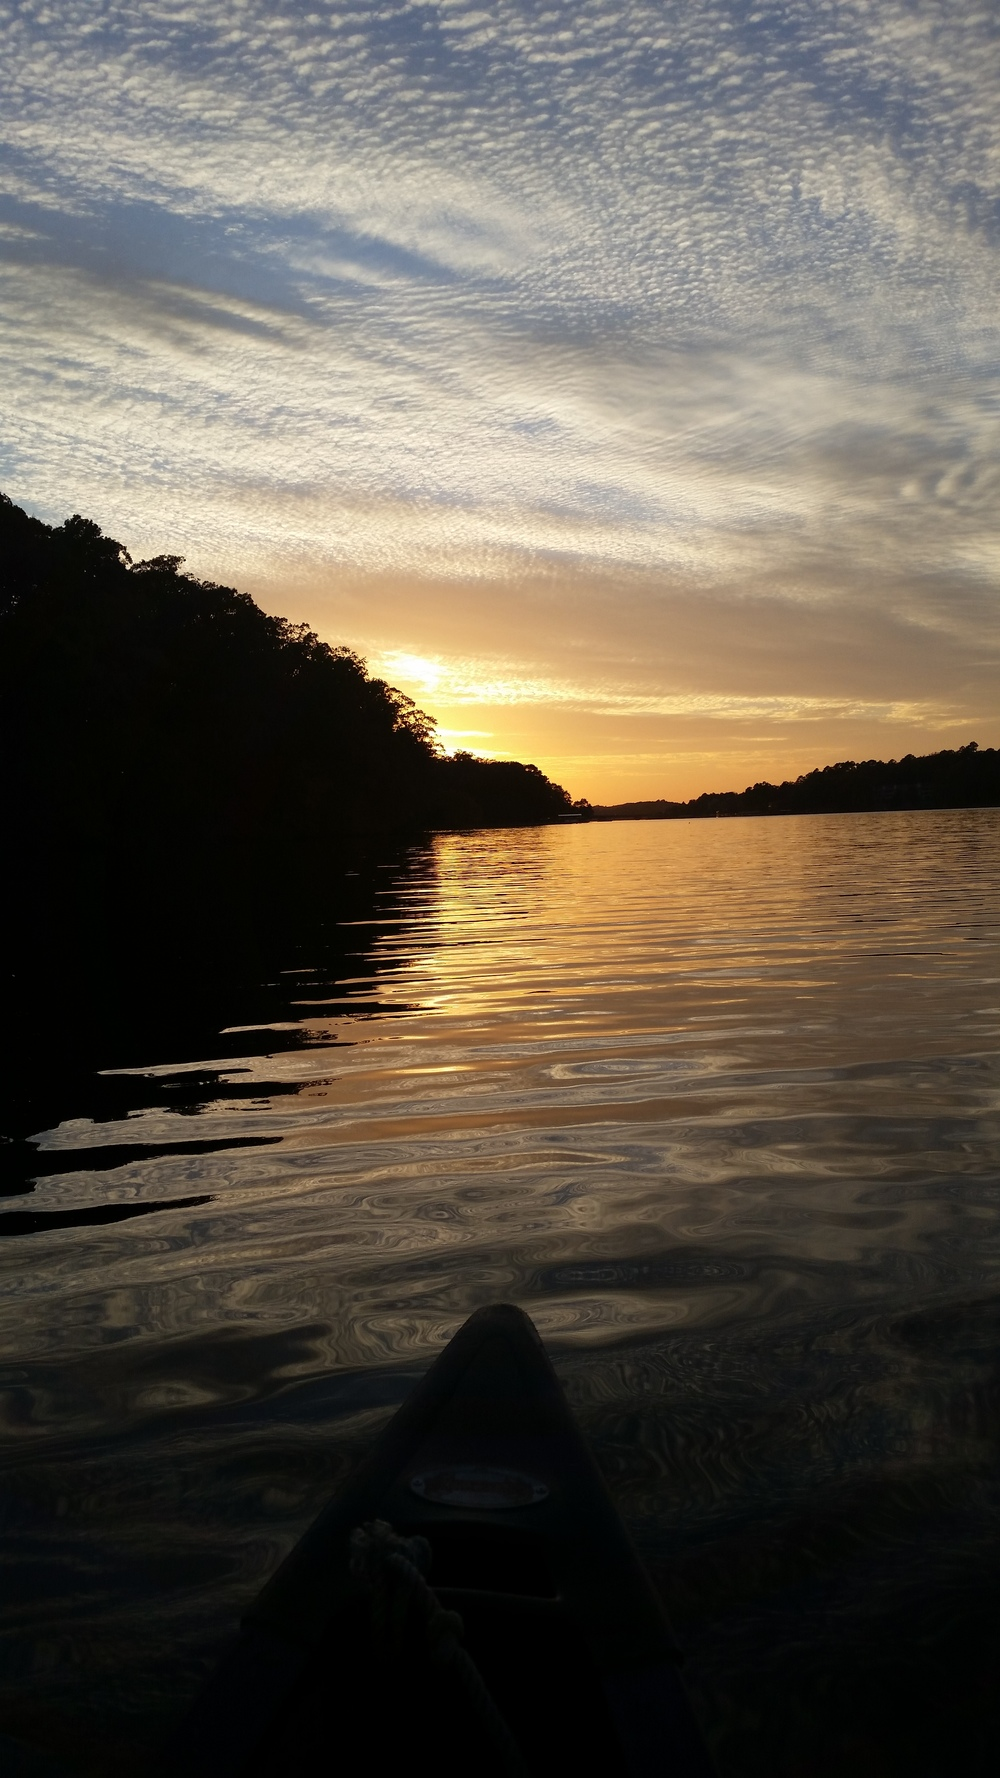 Lake Hamilton, Hot Springs, AR